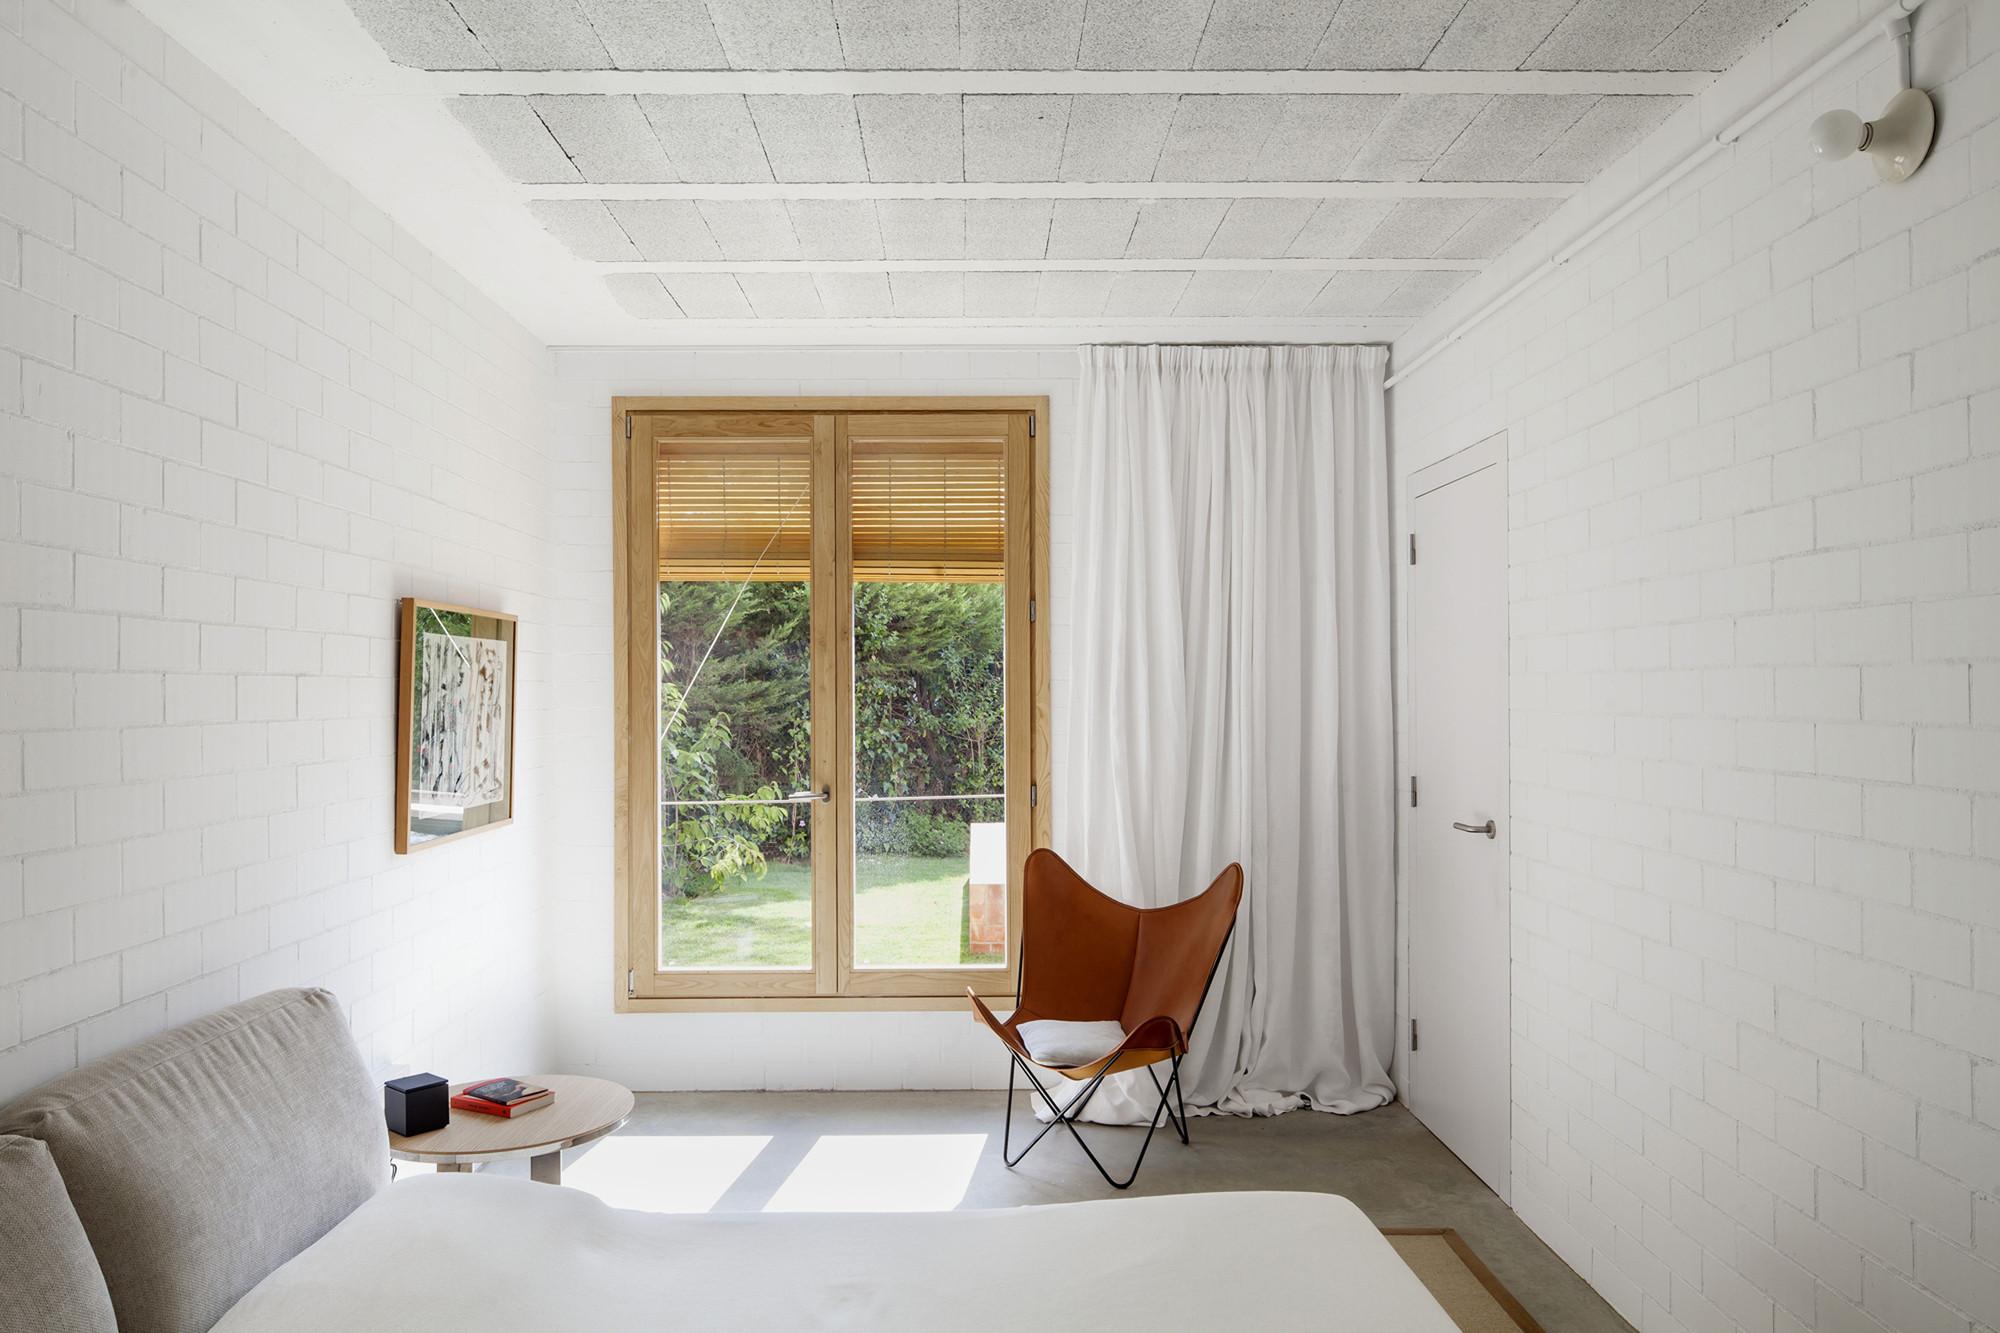 Casa 1101 / H Arquitectes . Image © Adrià Goula